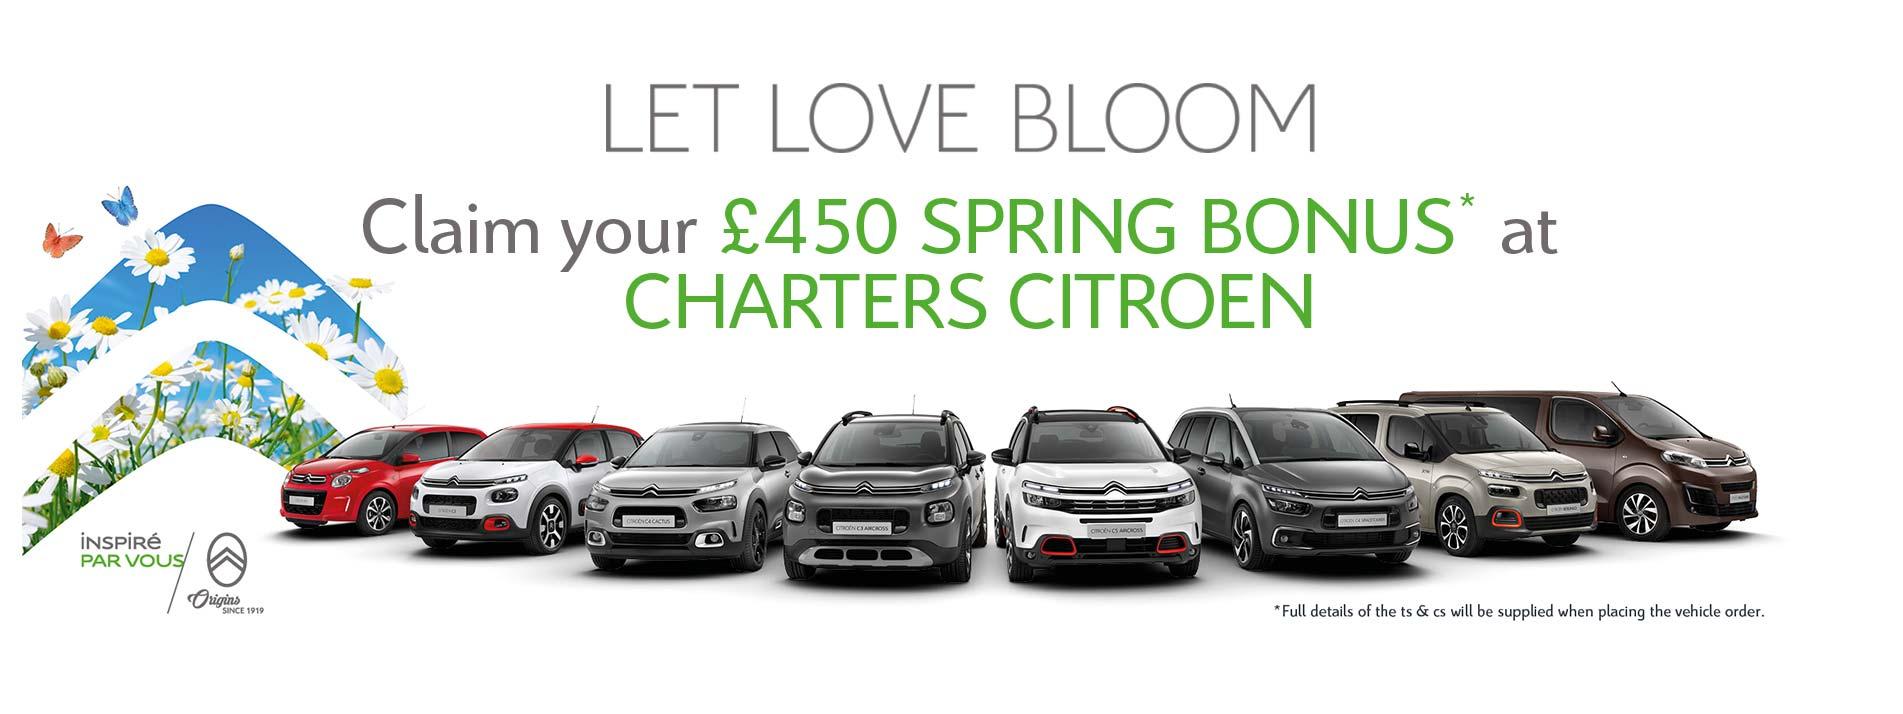 citroen-let-love-bloom-450-bonus-on-new-car-sales-m-sli